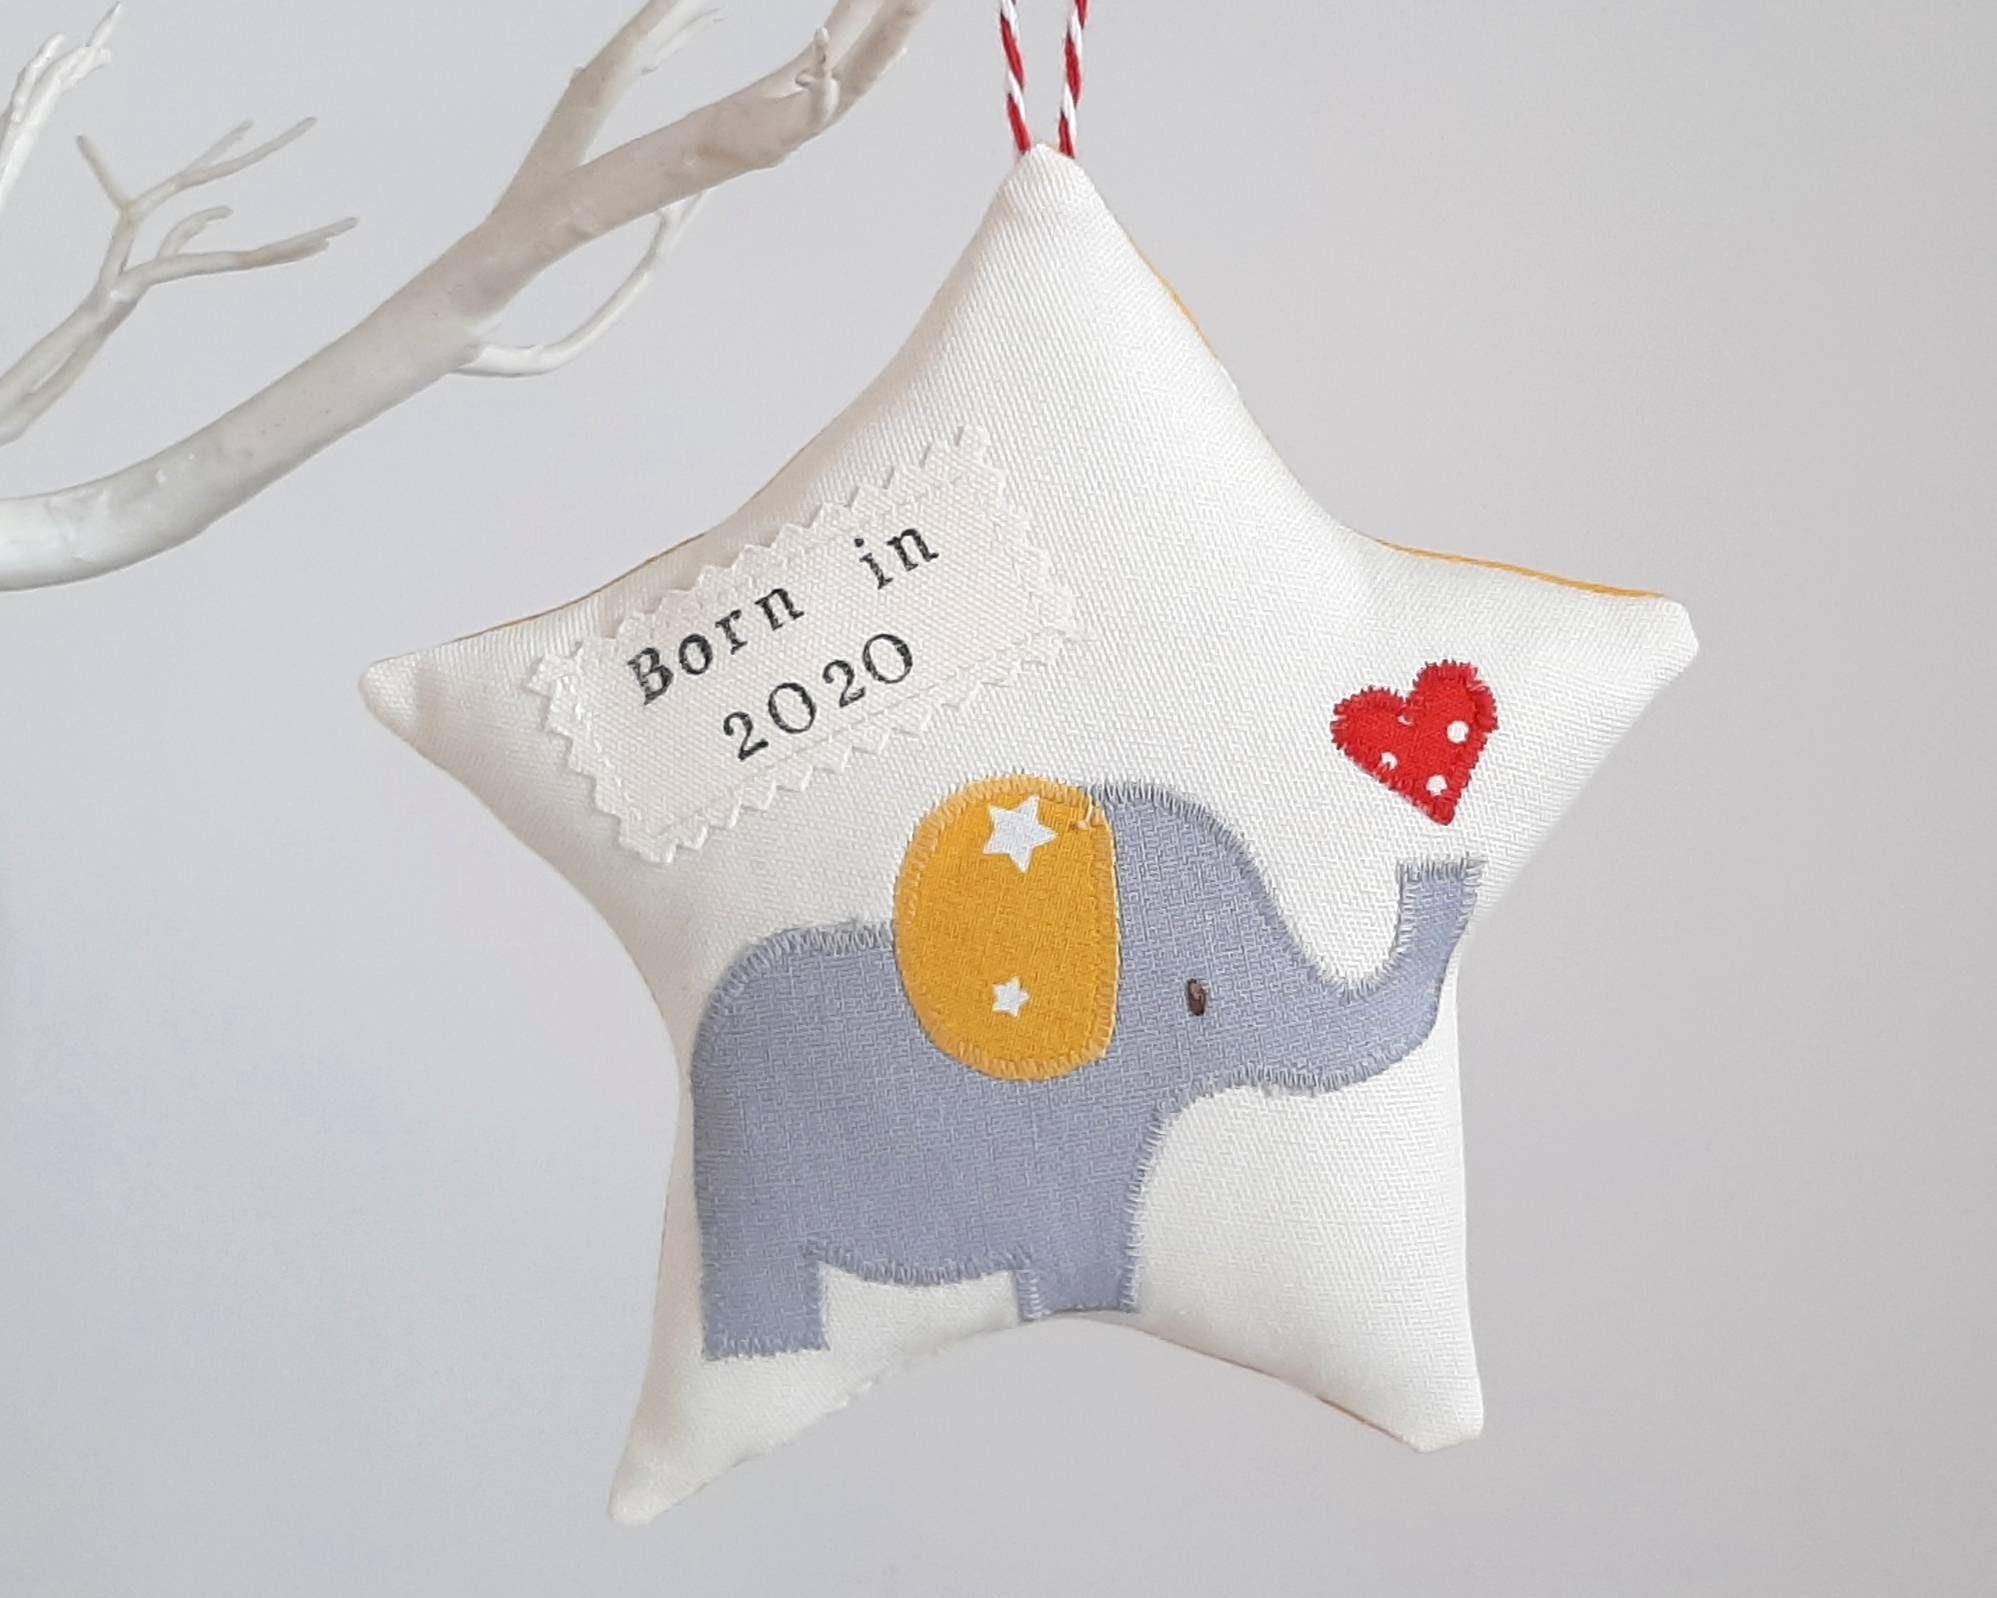 2020 star gift babygift Born In 2020,Hanging Star Decoration baby shower gift